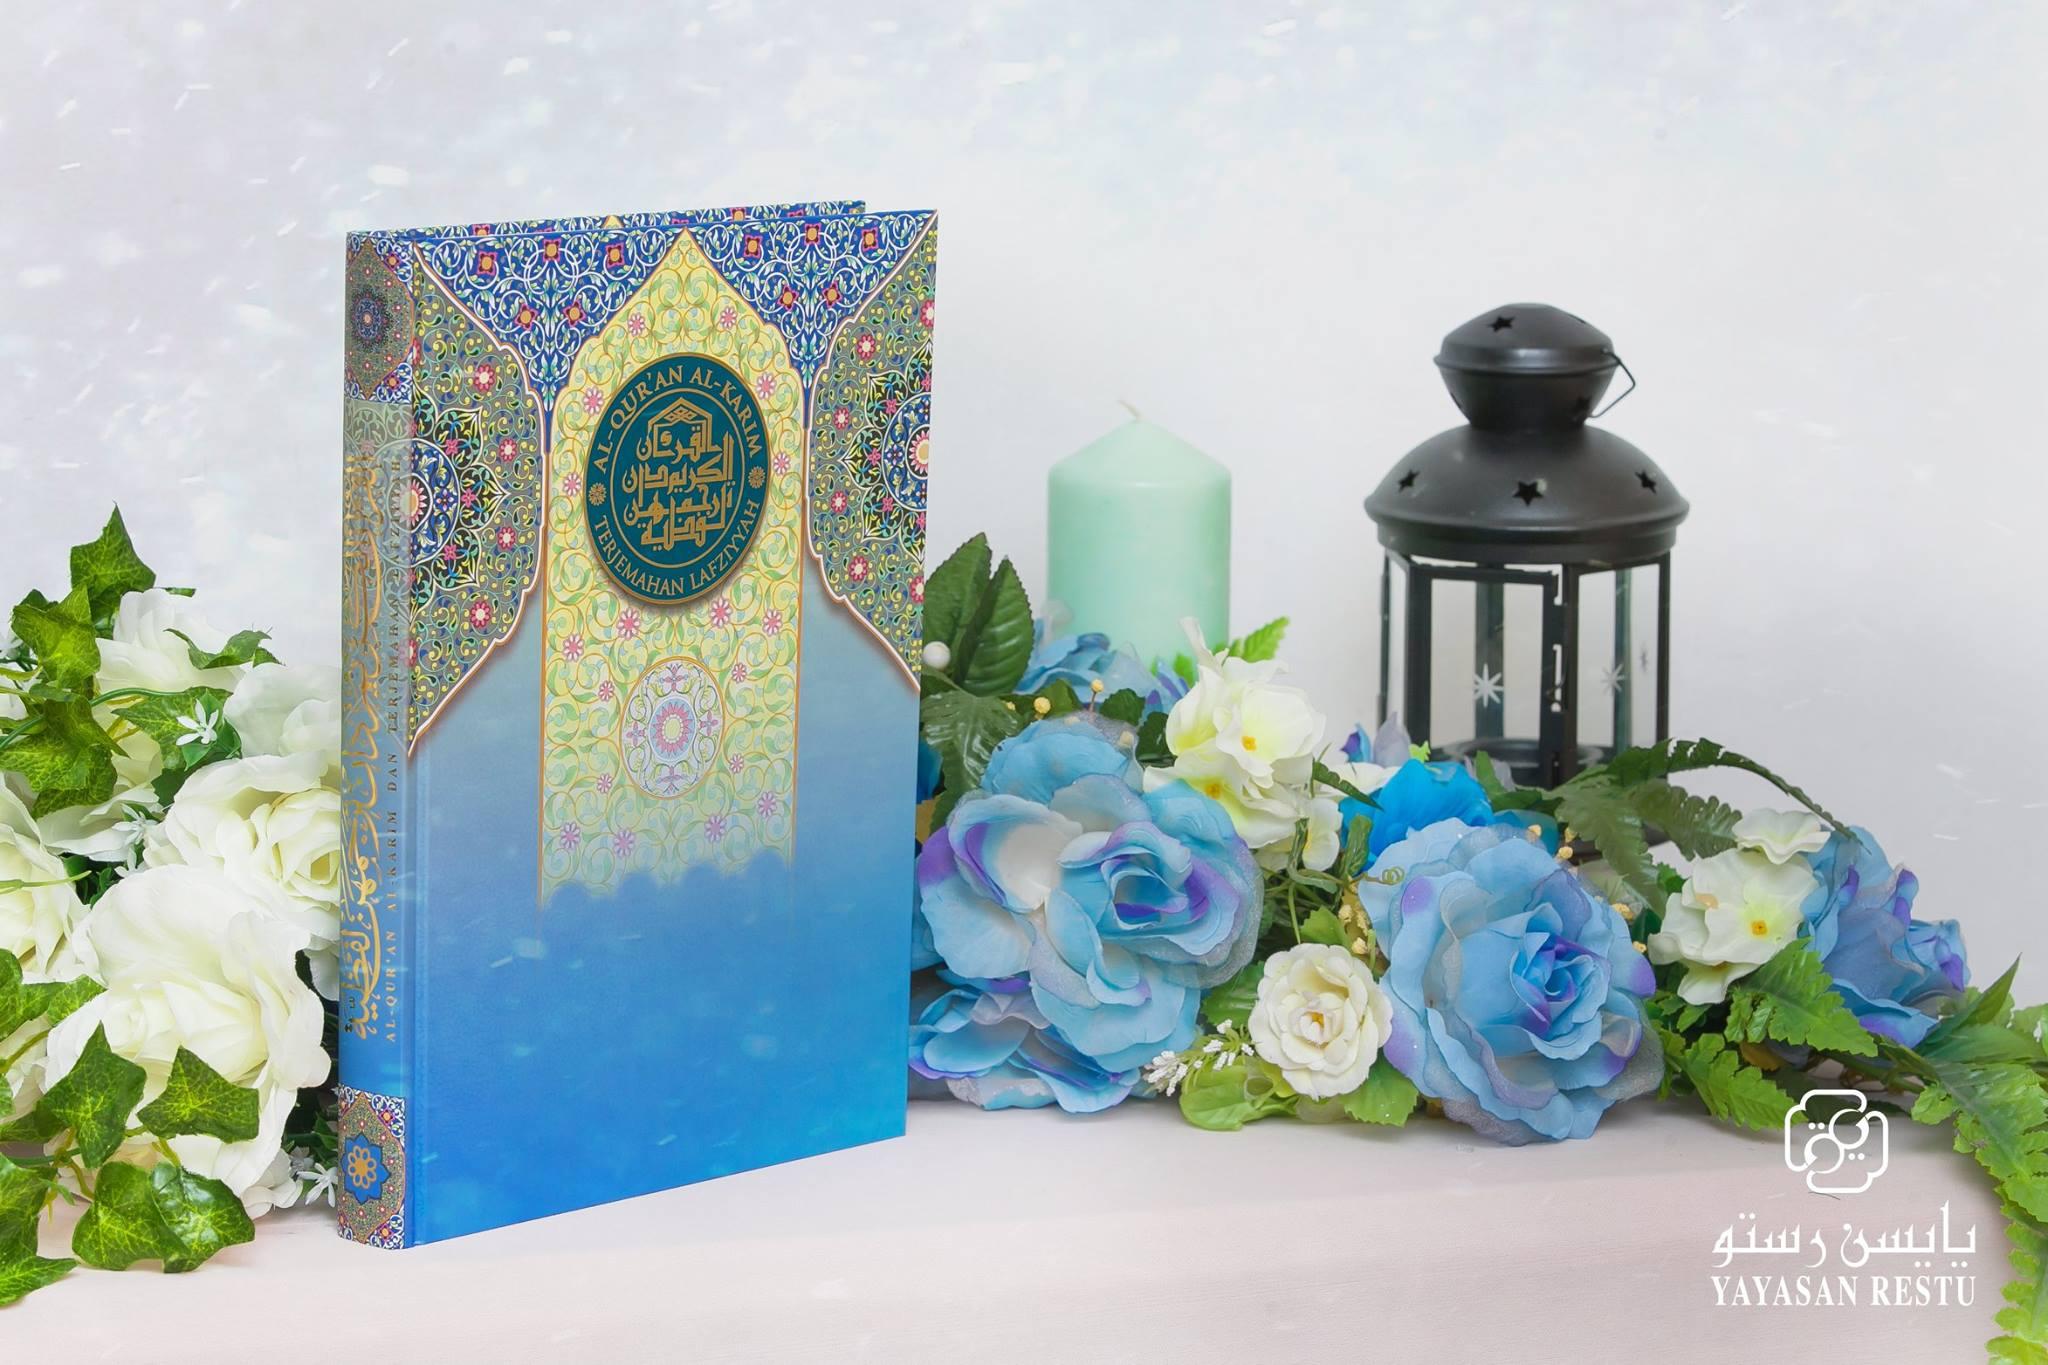 Al-Qura Terjemahan Lafziyyah Perkata Yayasan Restu